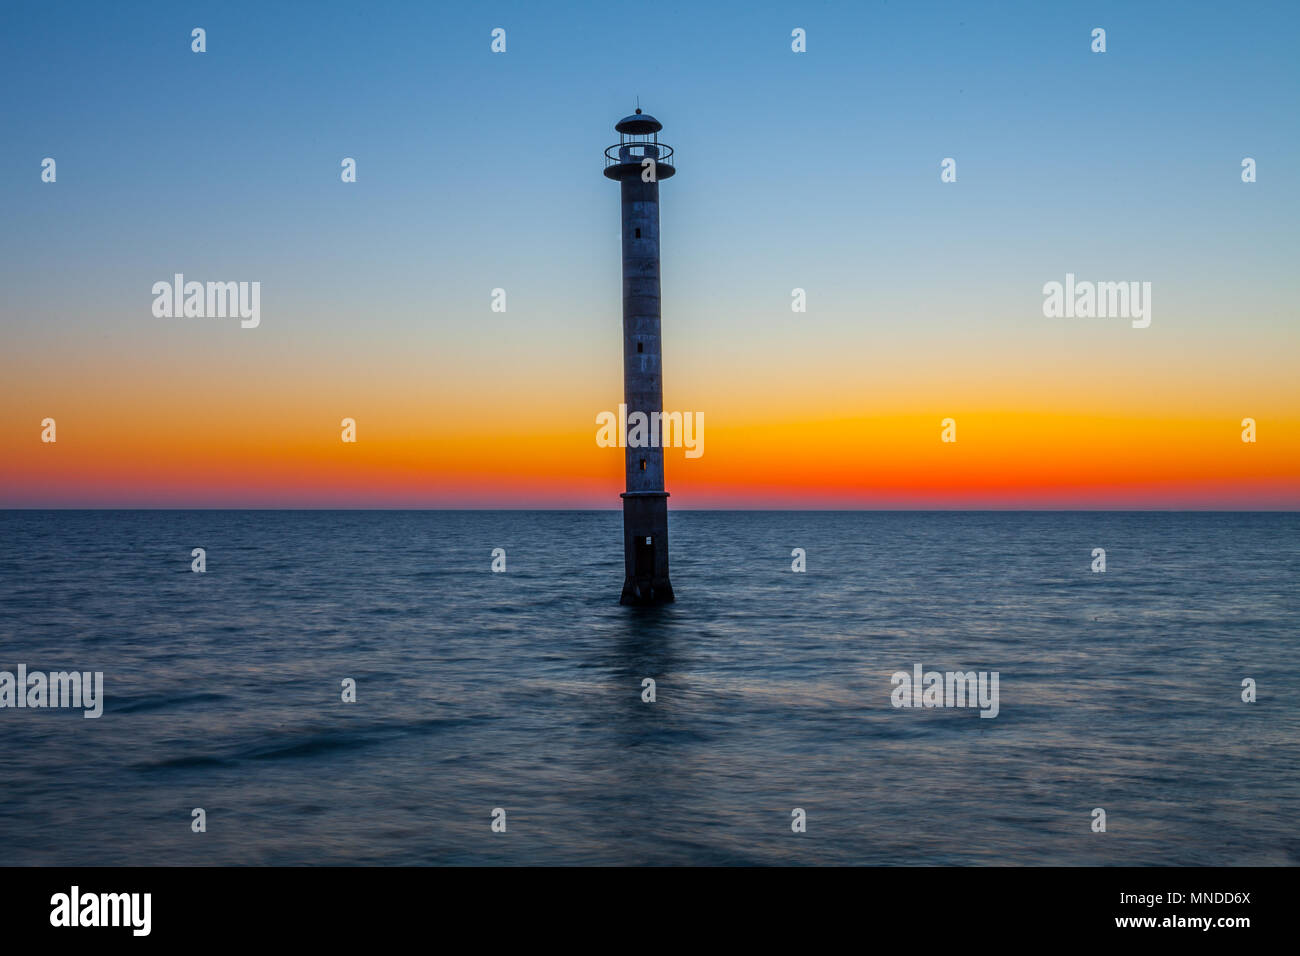 Skew lighthouse in the Baltic Sea. Late sunset time. Kiipsaare, Harilaid, Saaremaa, Estonia, Europe. - Stock Image